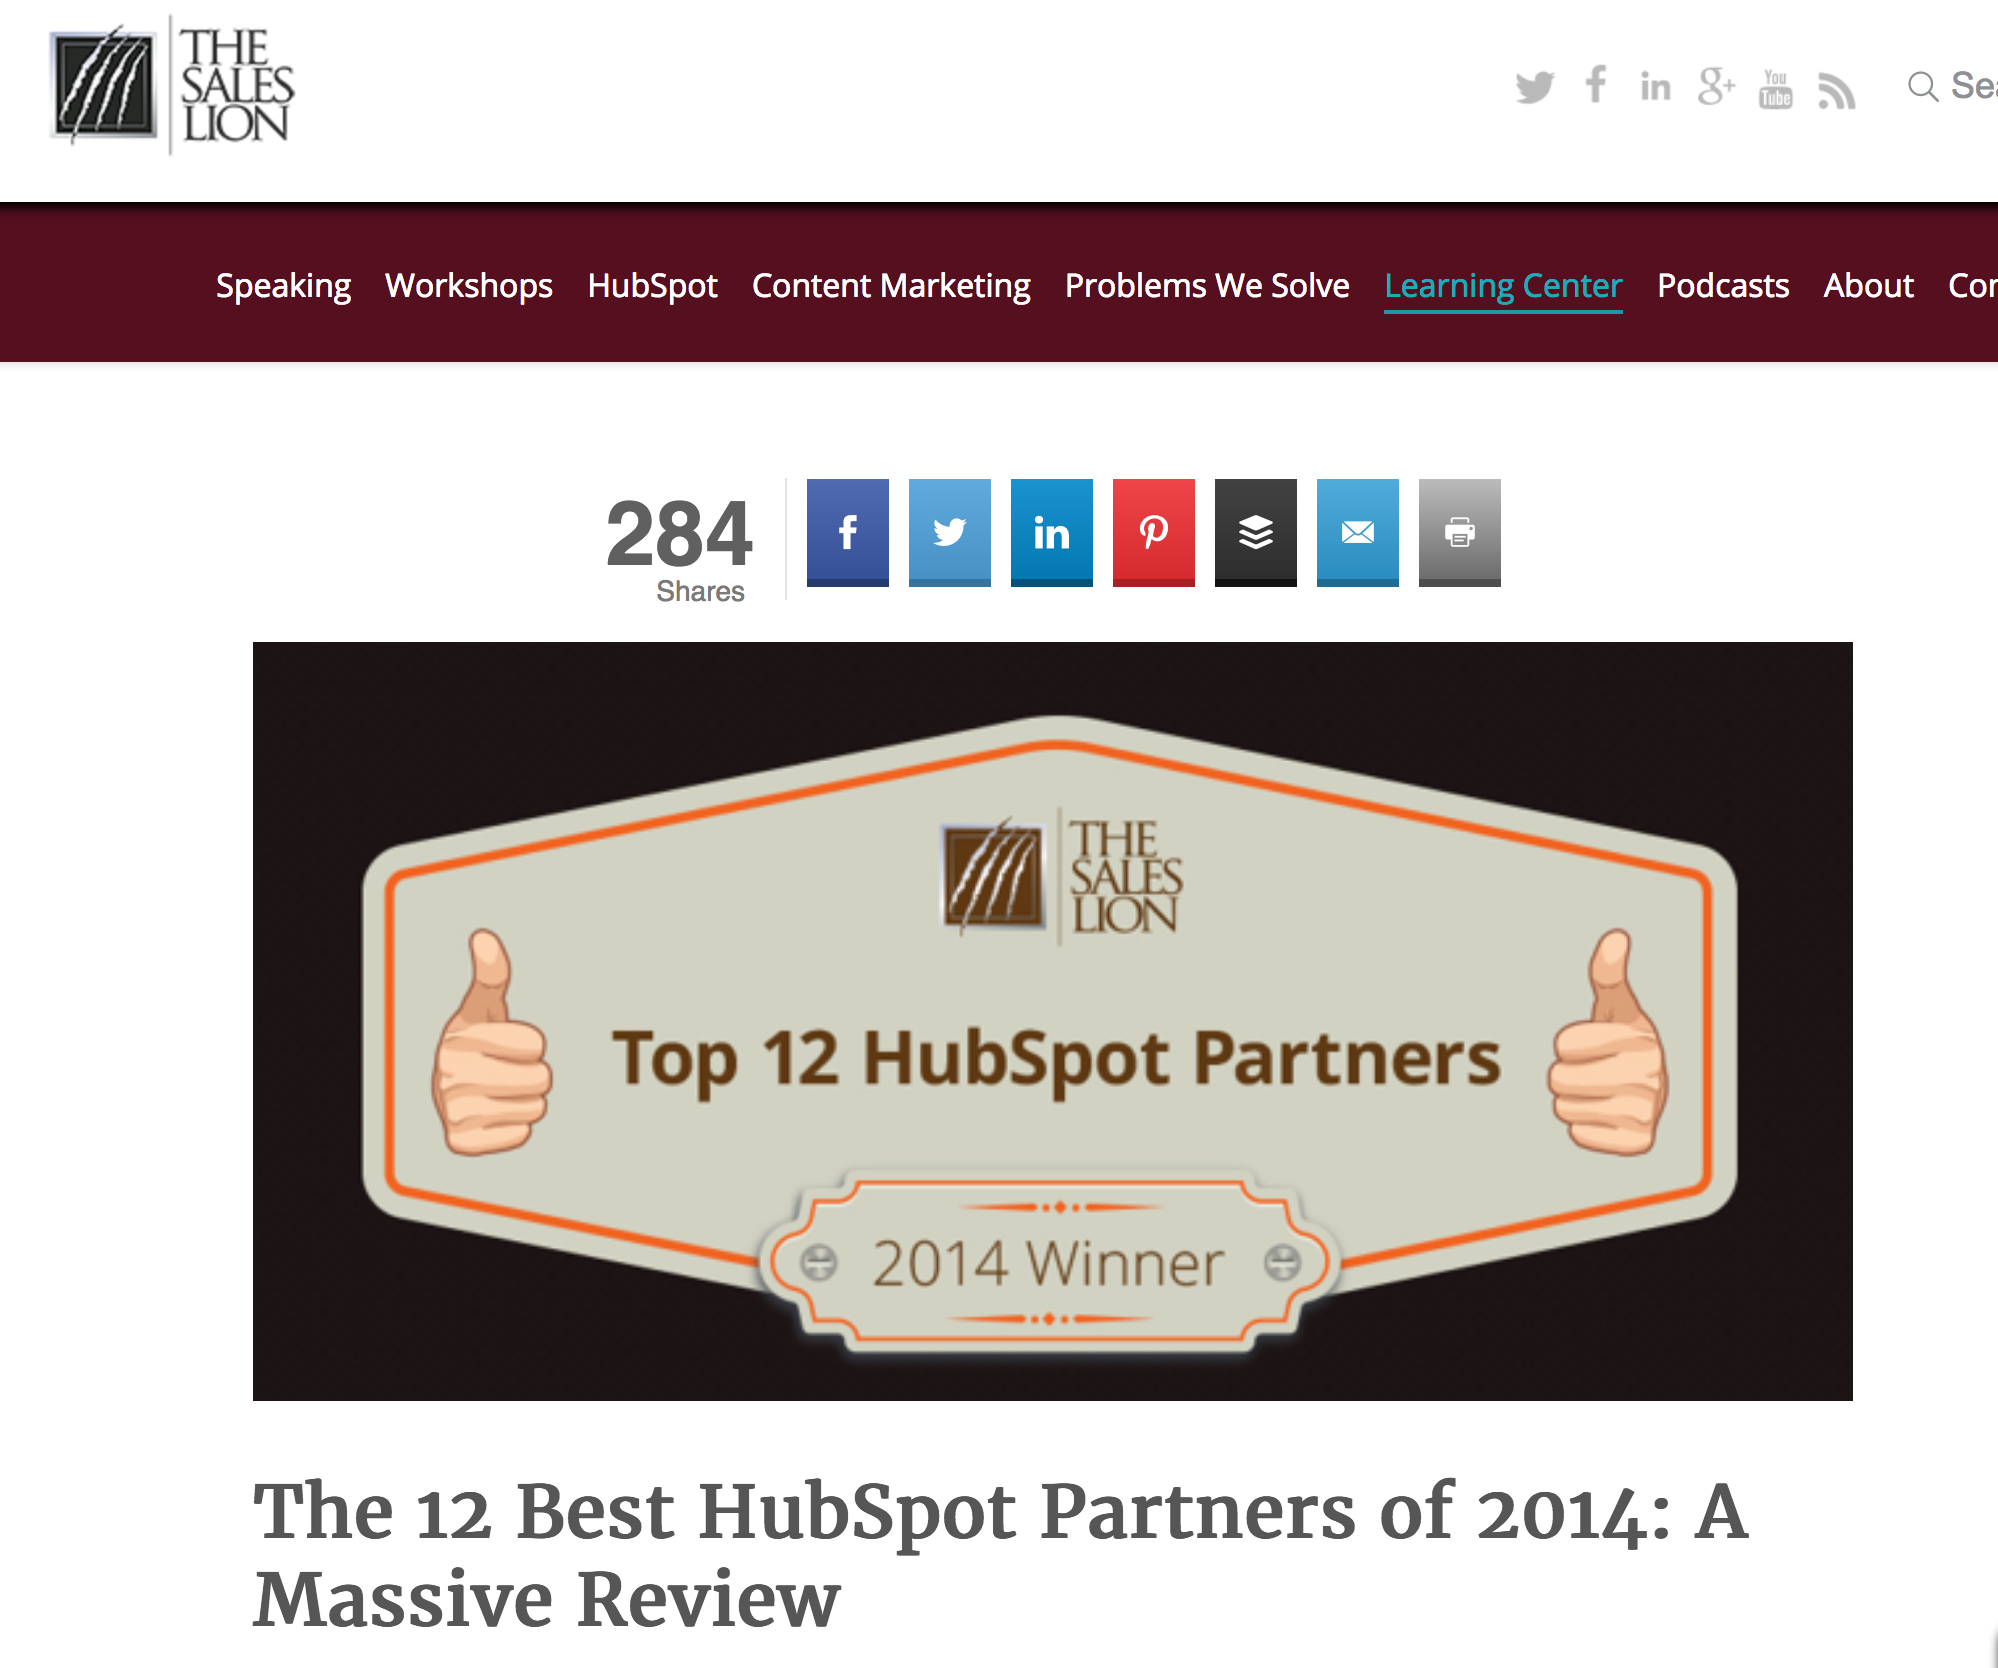 Sales Lion Top HubSpot Partners